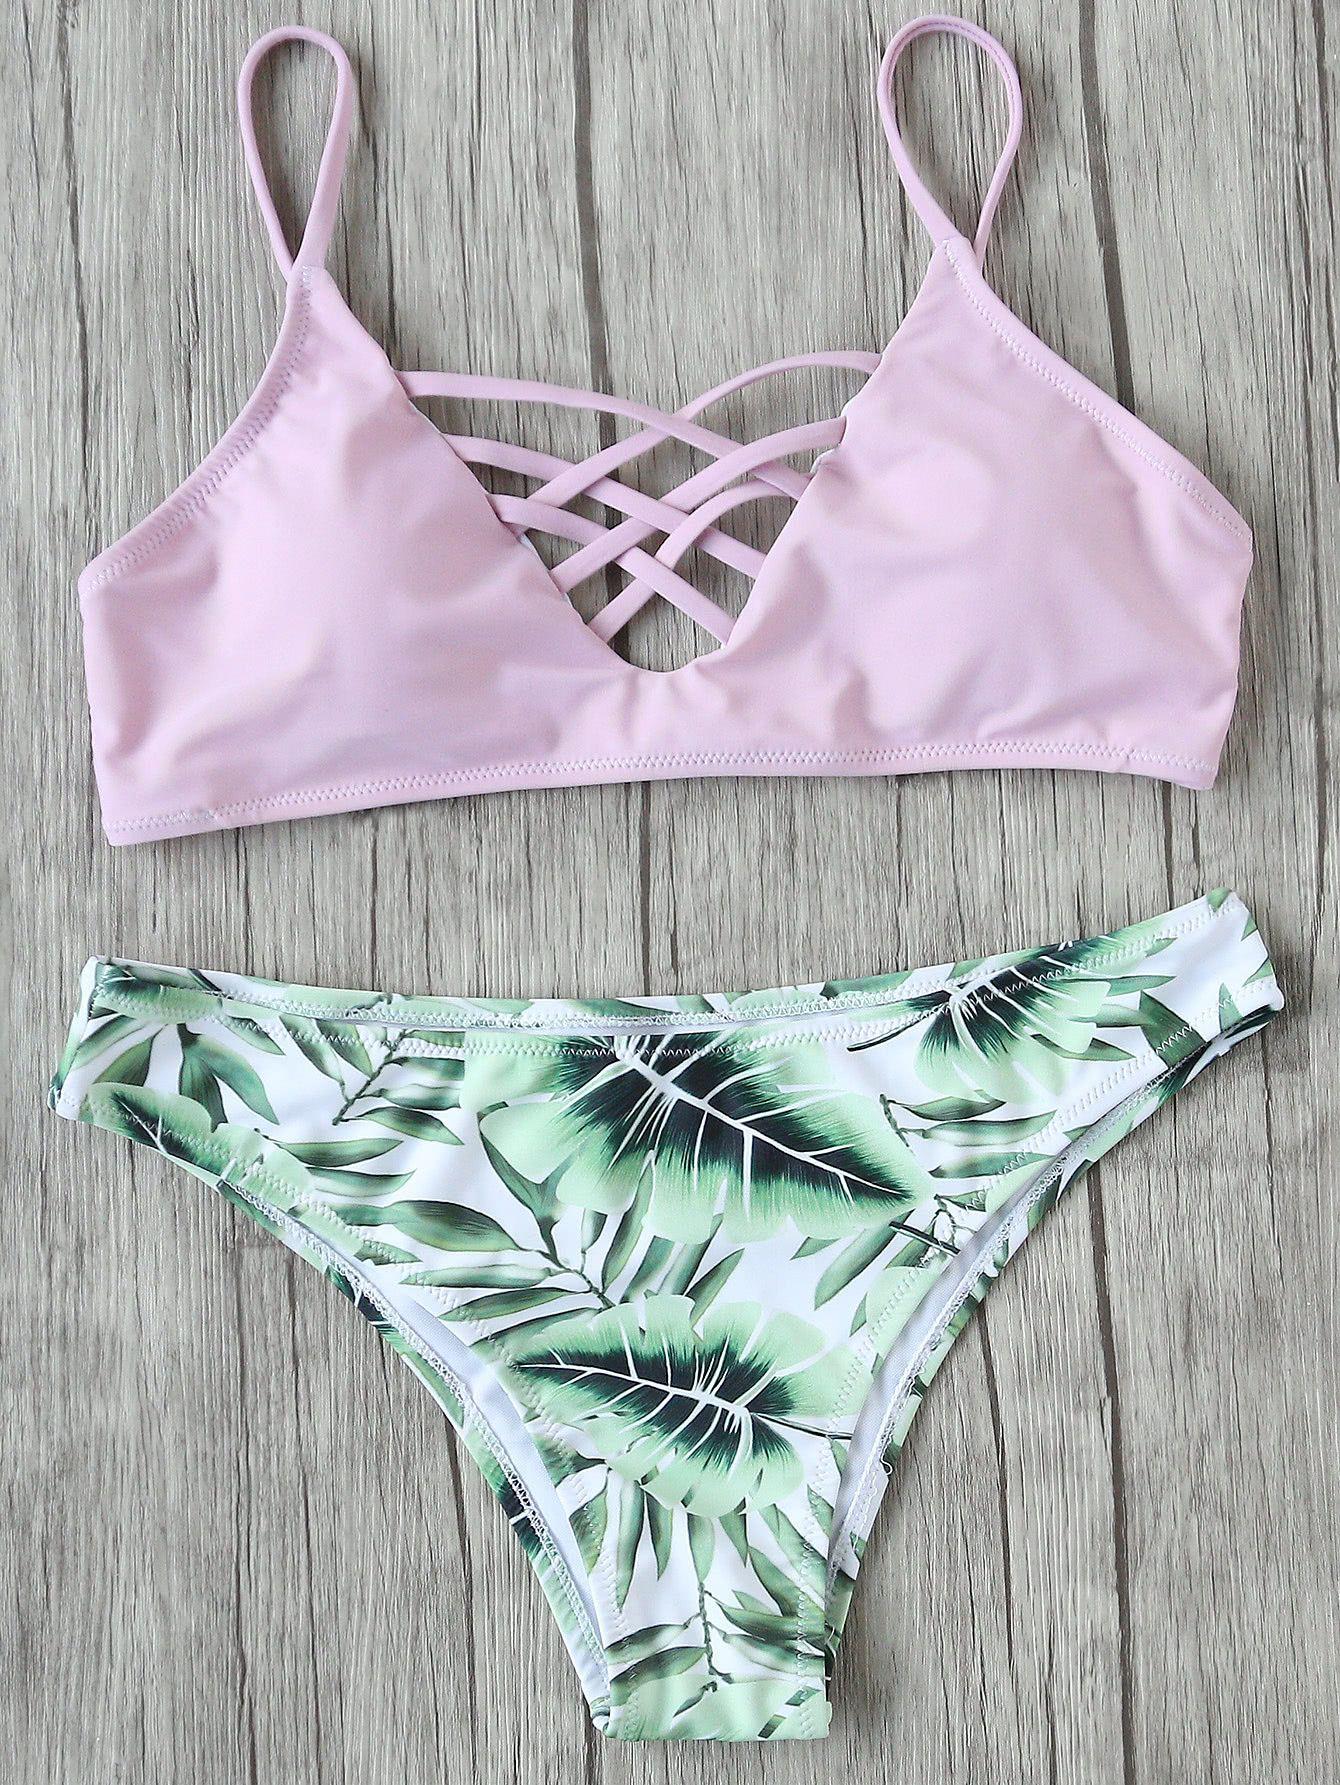 ¡Cómpralo ya!. Leaf Print Criss Cross Mix & Match Bikini Set. Green Pink Bikinis Casual Cute Vacation Push Up Polyester YES Print Swimwear. , bikini, bikini, biquini, conjuntosdebikinis, twopiece, bikini, bikini, bikini, bikini, bikinis. Bikini  de mujer   de SheIn.